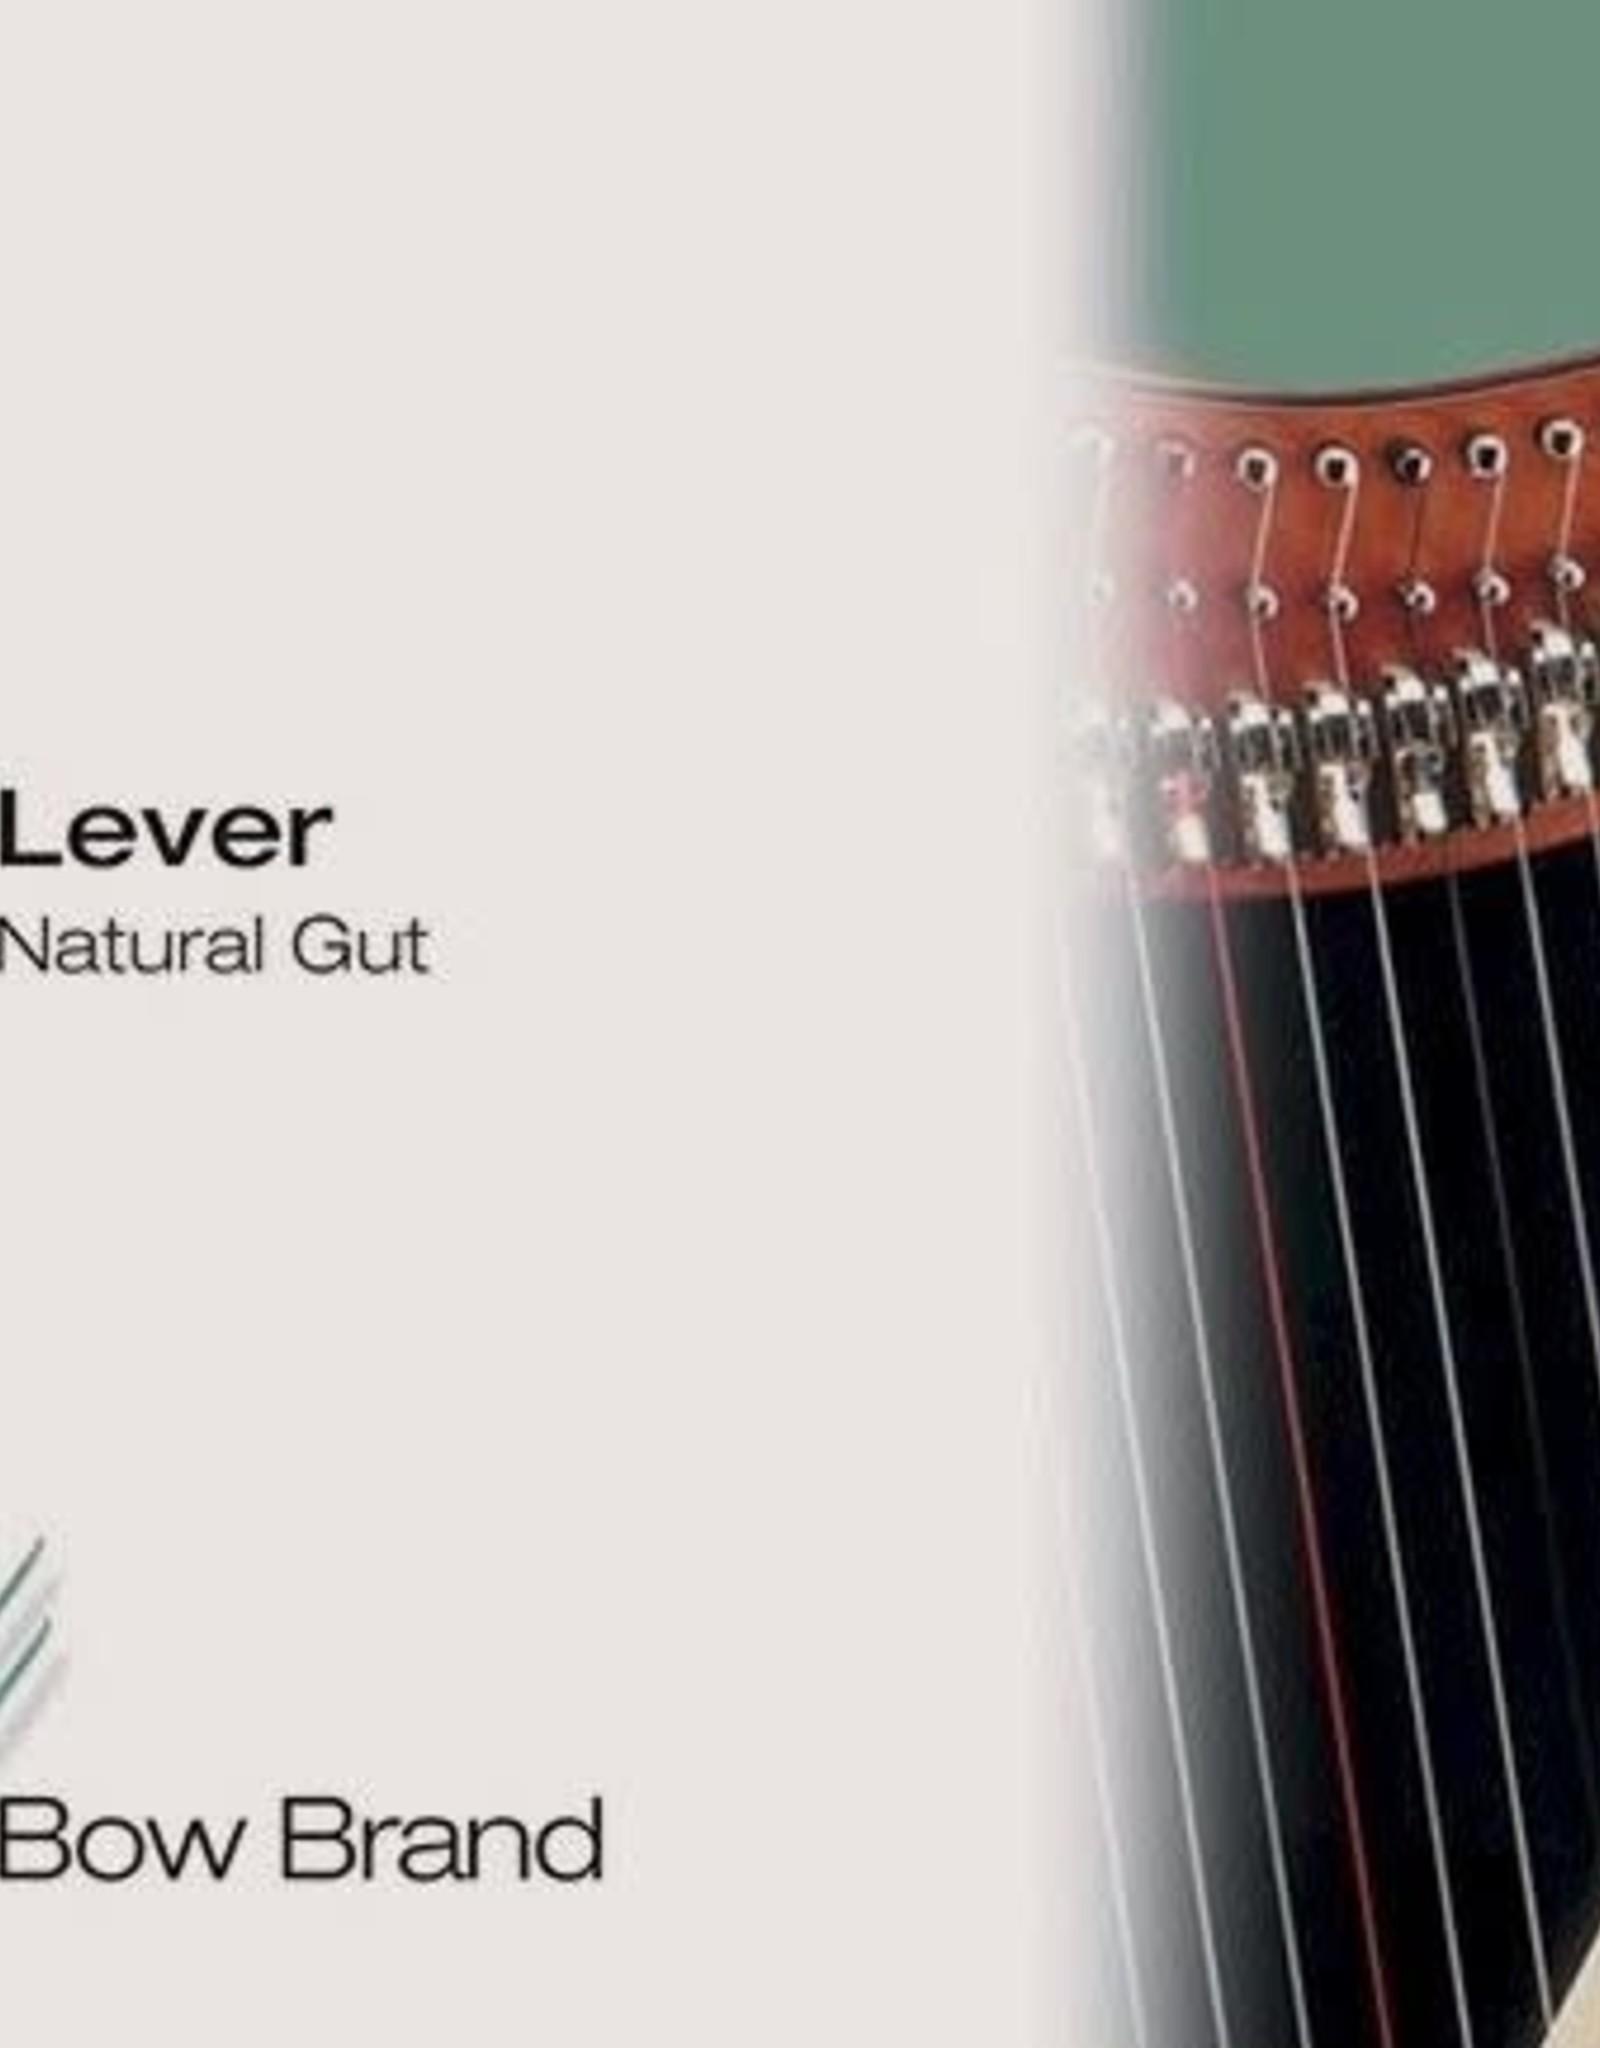 BOW BRAND  klep darm - lever GUT (set) 1ste octaaf - inclusief 5% korting